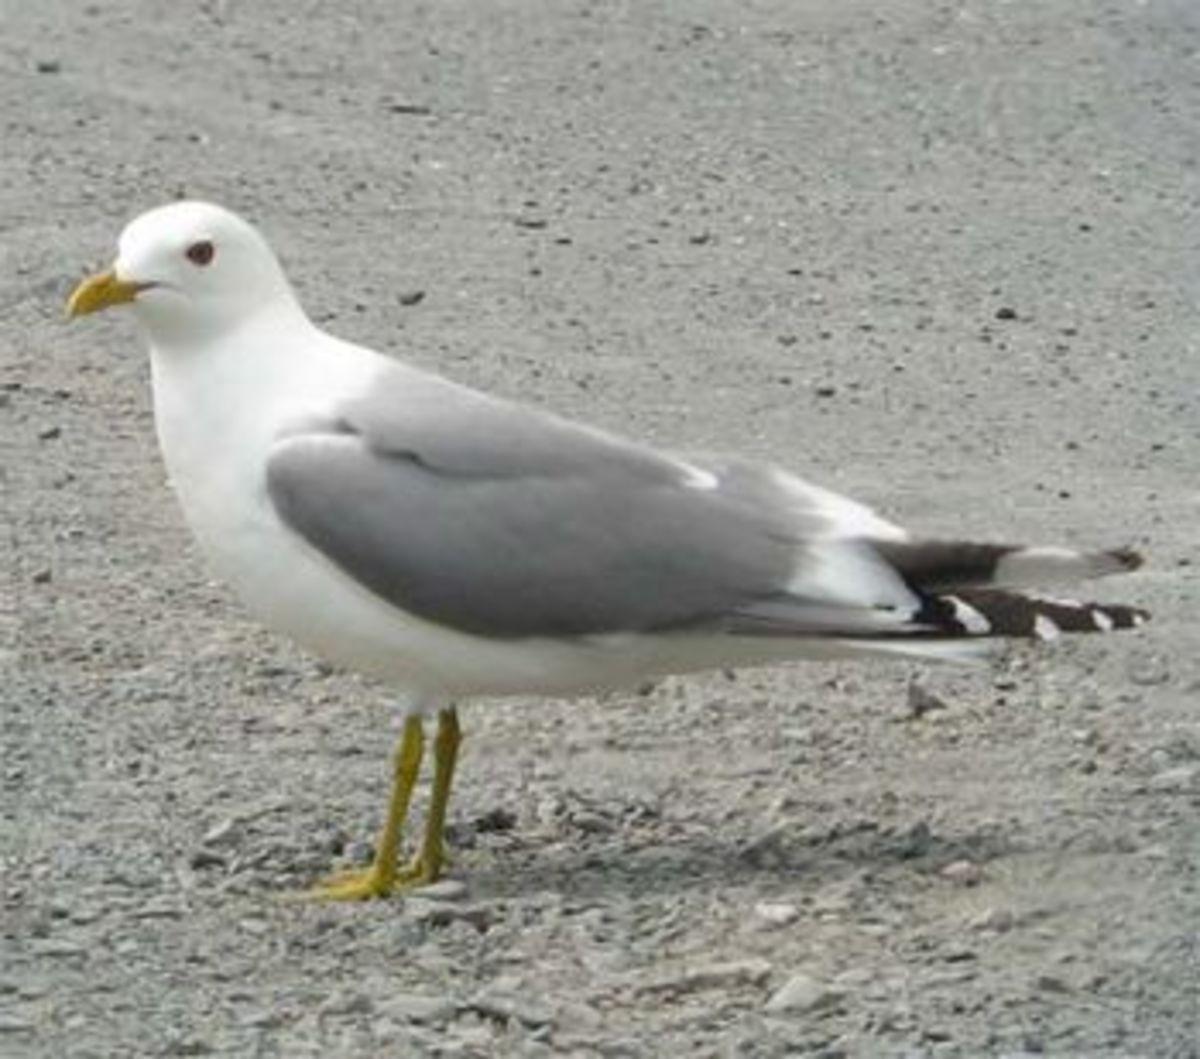 Common American Gull